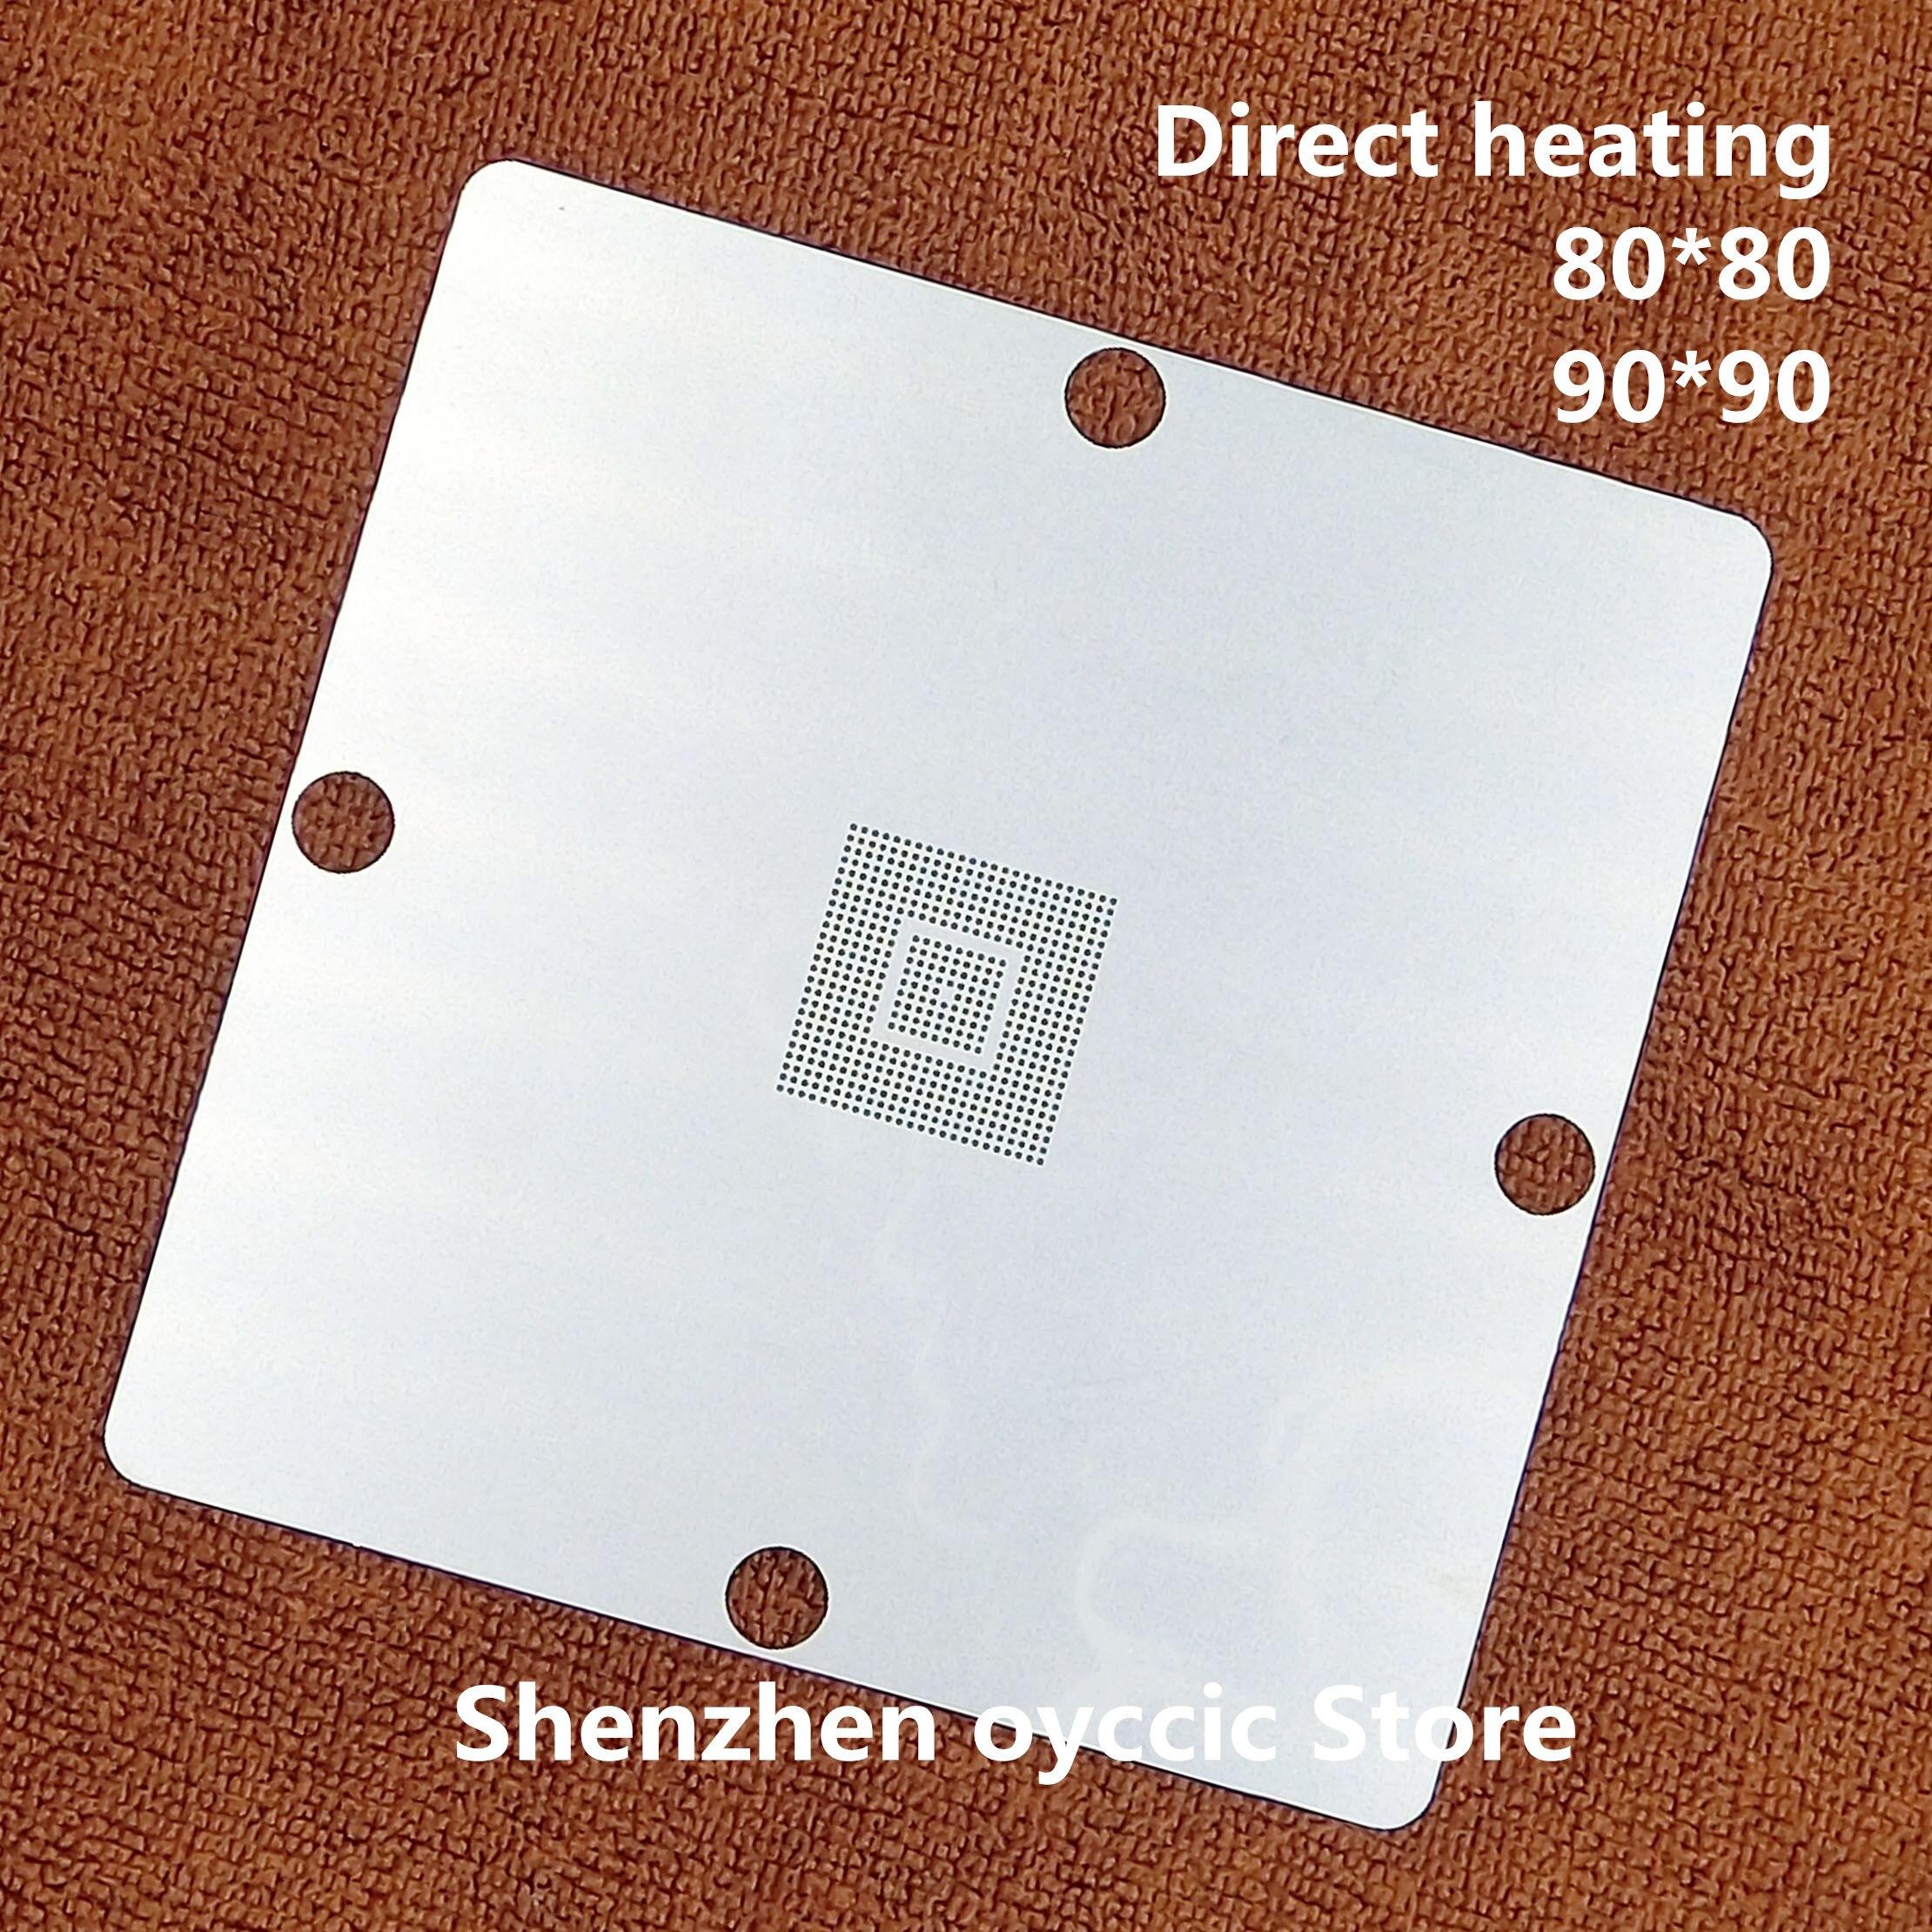 Direct heating 80*80 90*90 S5PV210AA0-LA40 S5PV210A80-LA40 S5PV210AH-AO S5PV210AH-A0 BGA Stencil TemplateDirect heating 80*80 90*90 S5PV210AA0-LA40 S5PV210A80-LA40 S5PV210AH-AO S5PV210AH-A0 BGA Stencil Template